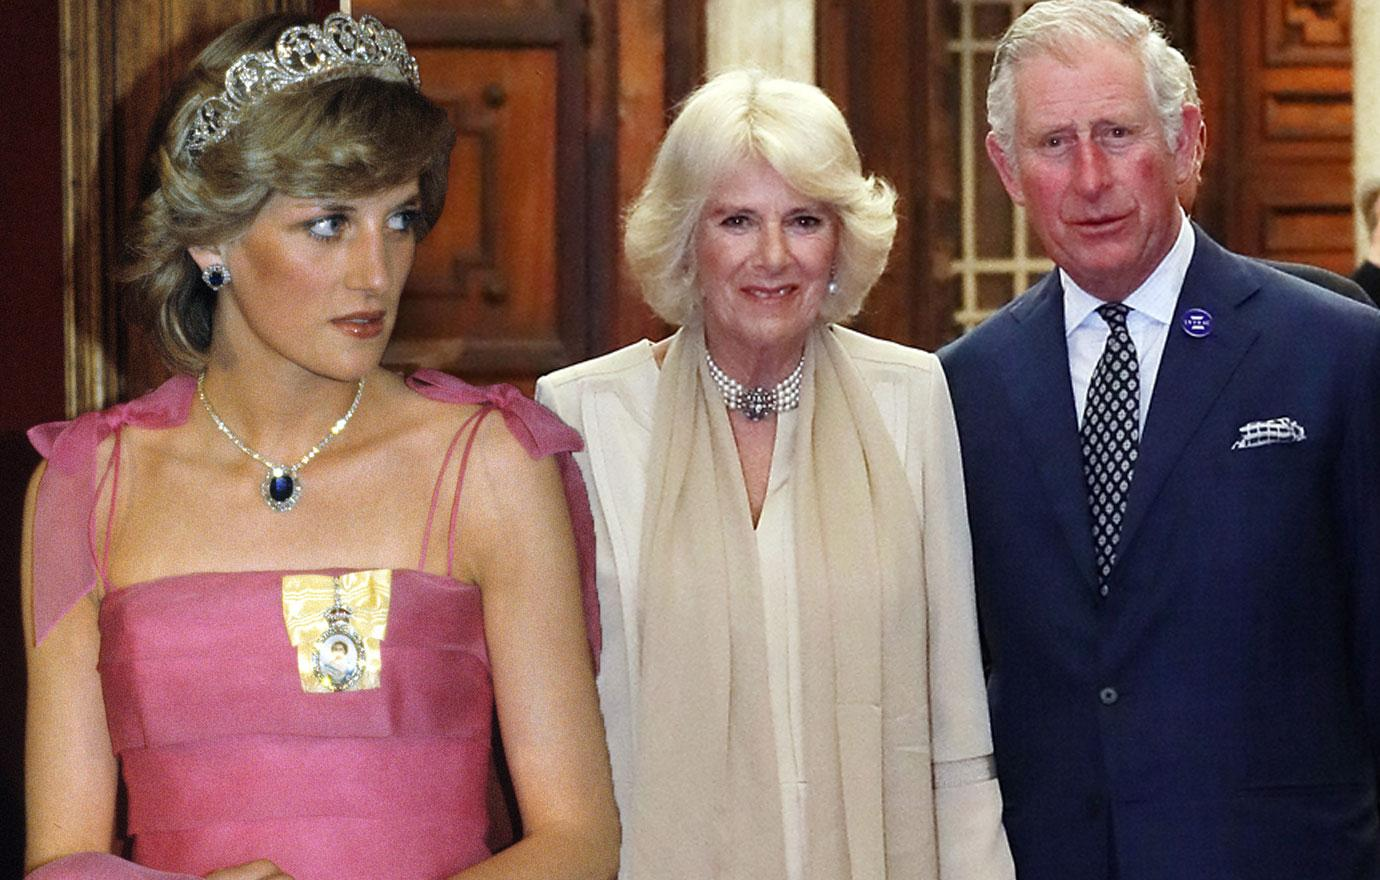 Princess Diana Heard Prince Charles Dirty Phone Sex With Camilla